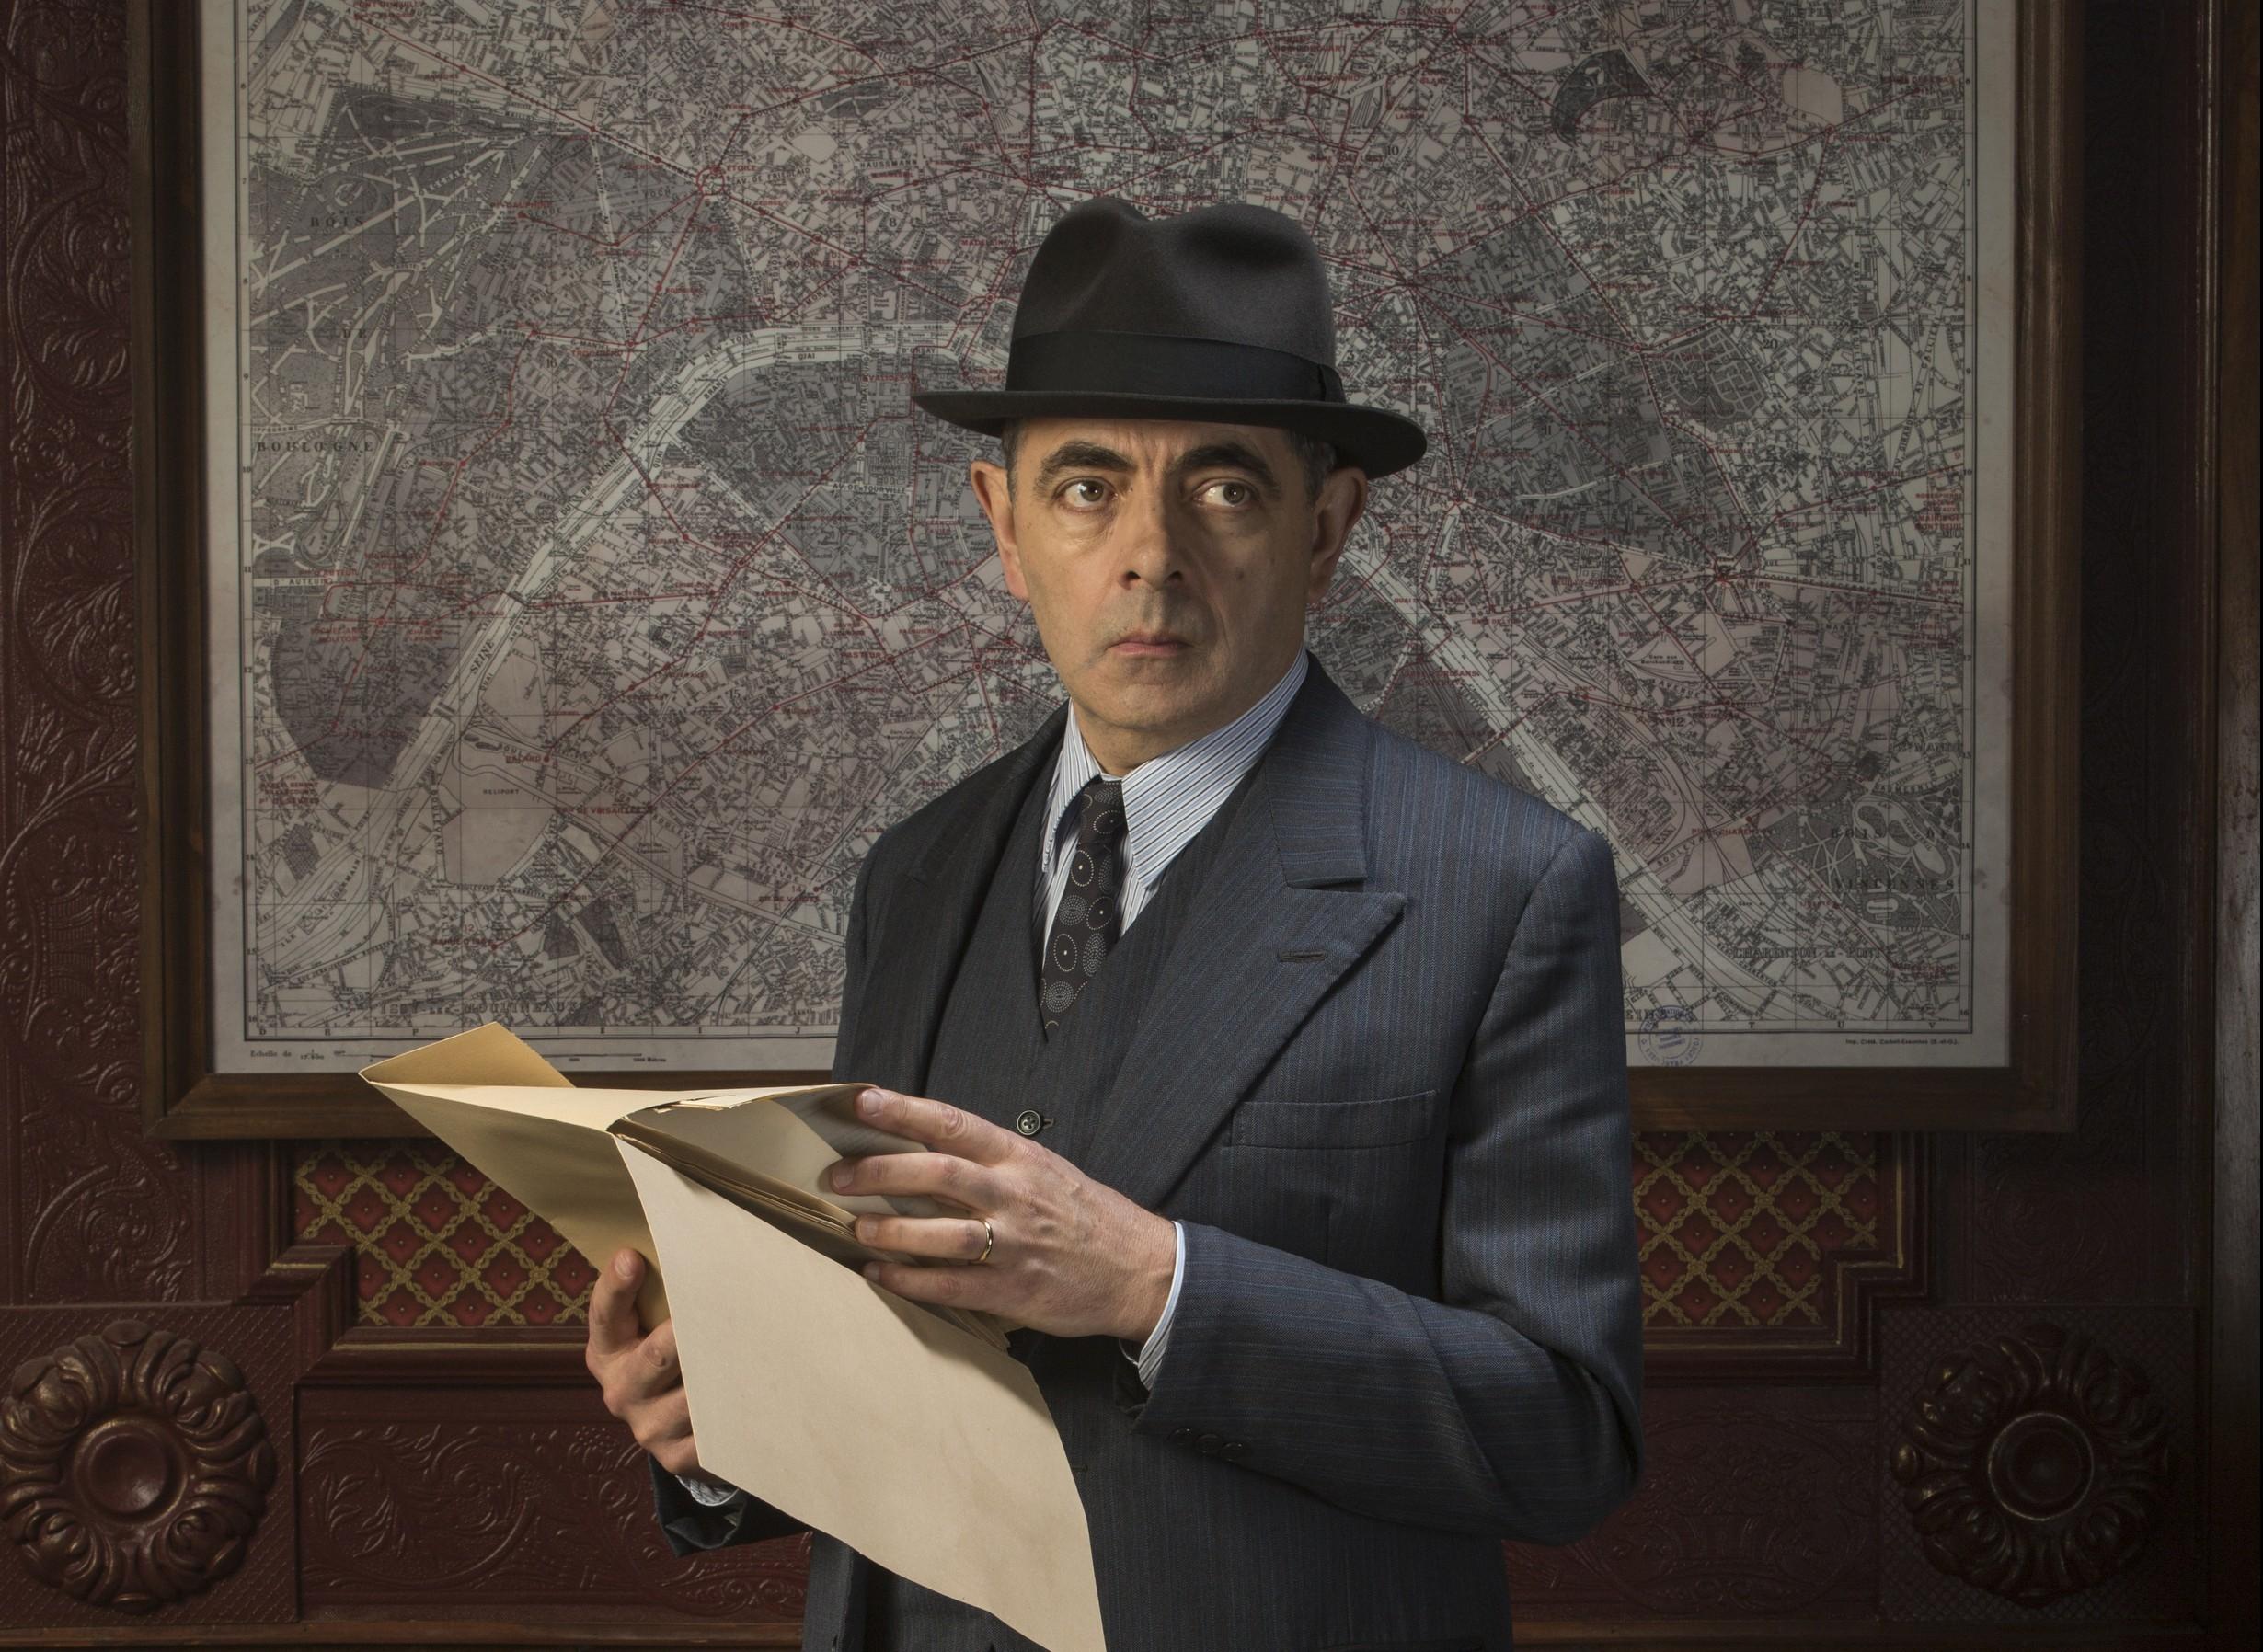 Rowan Atkinson as Maigret (ITV/Ealing Studios/Colin Hutton)